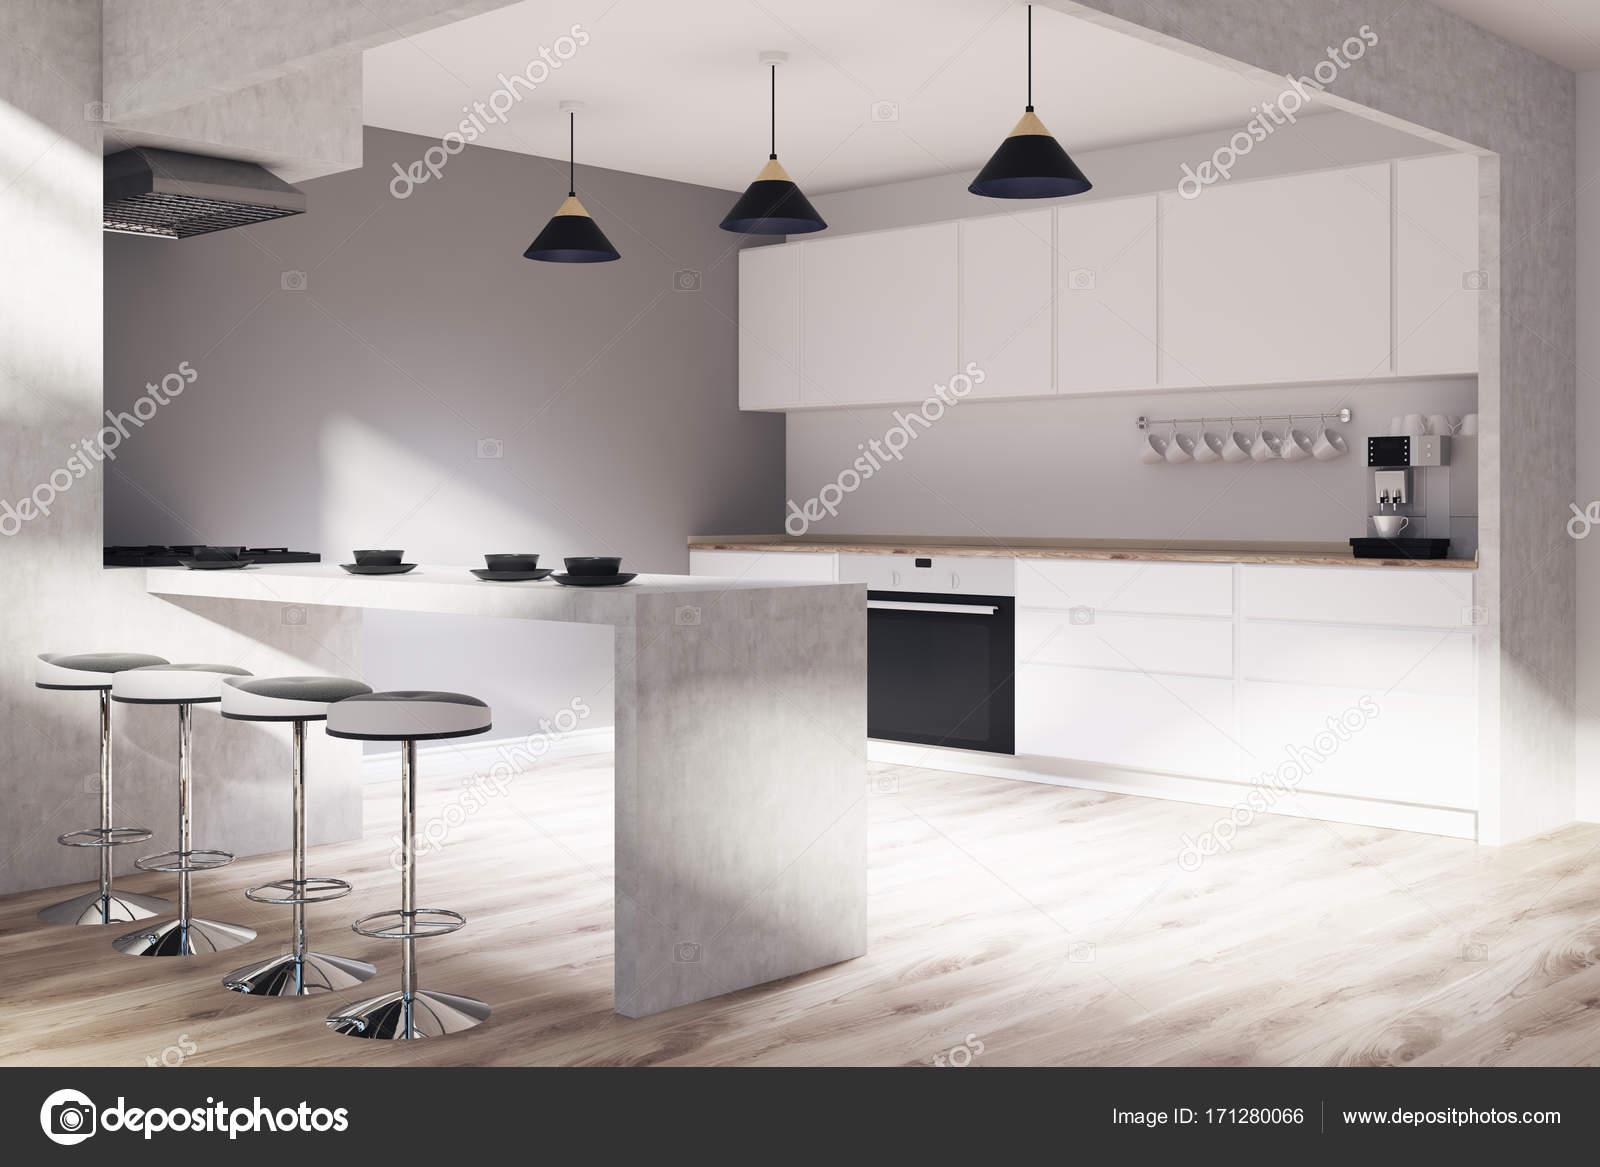 corner hutch kitchen antique table 灰色和木制厨房角落 图库照片 c denisismagilov 171280066